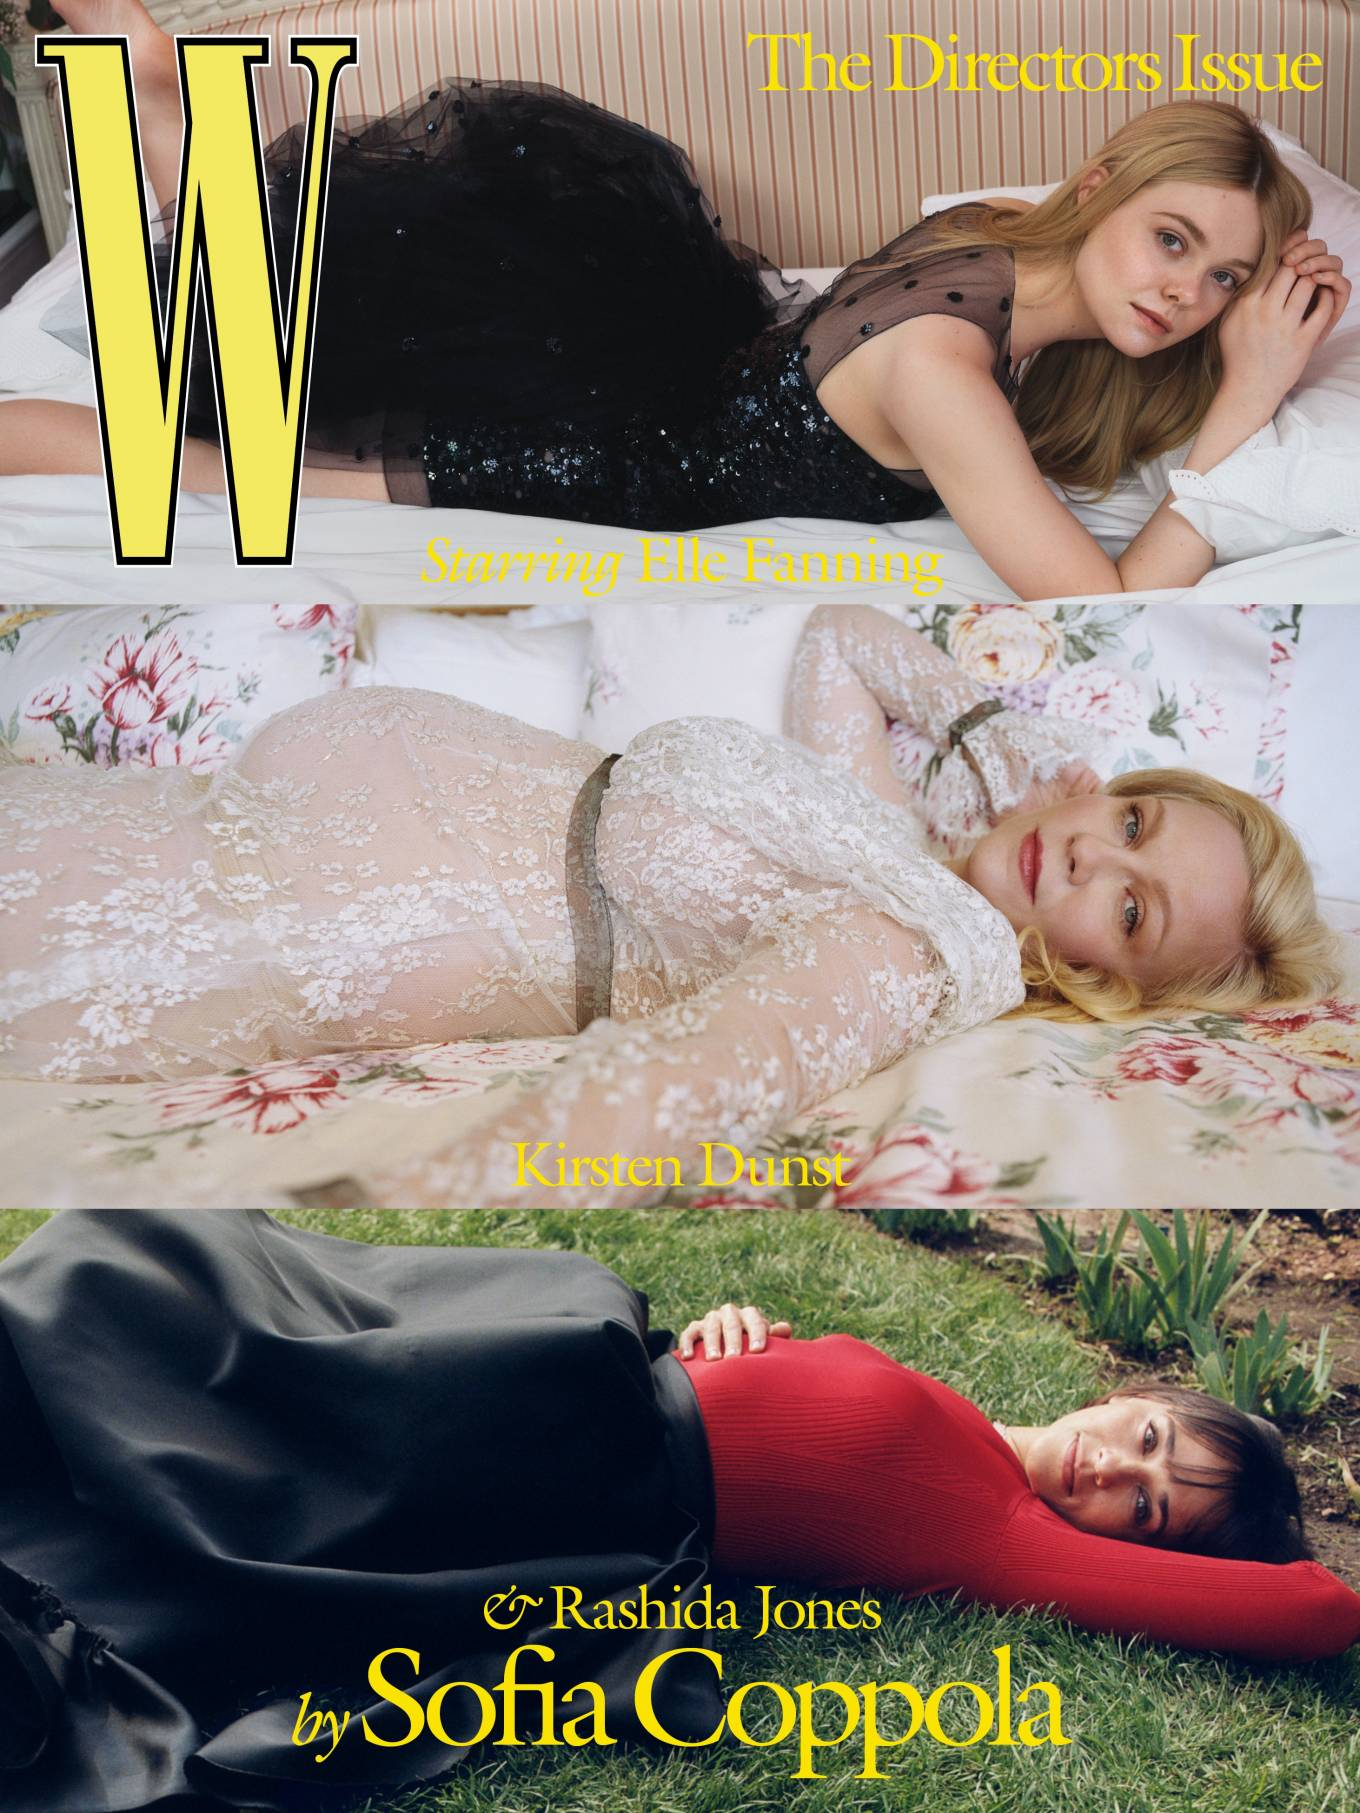 Elle Fanning, Kirsten Dunst and Rashida Jones - W Magazine (March 2021)